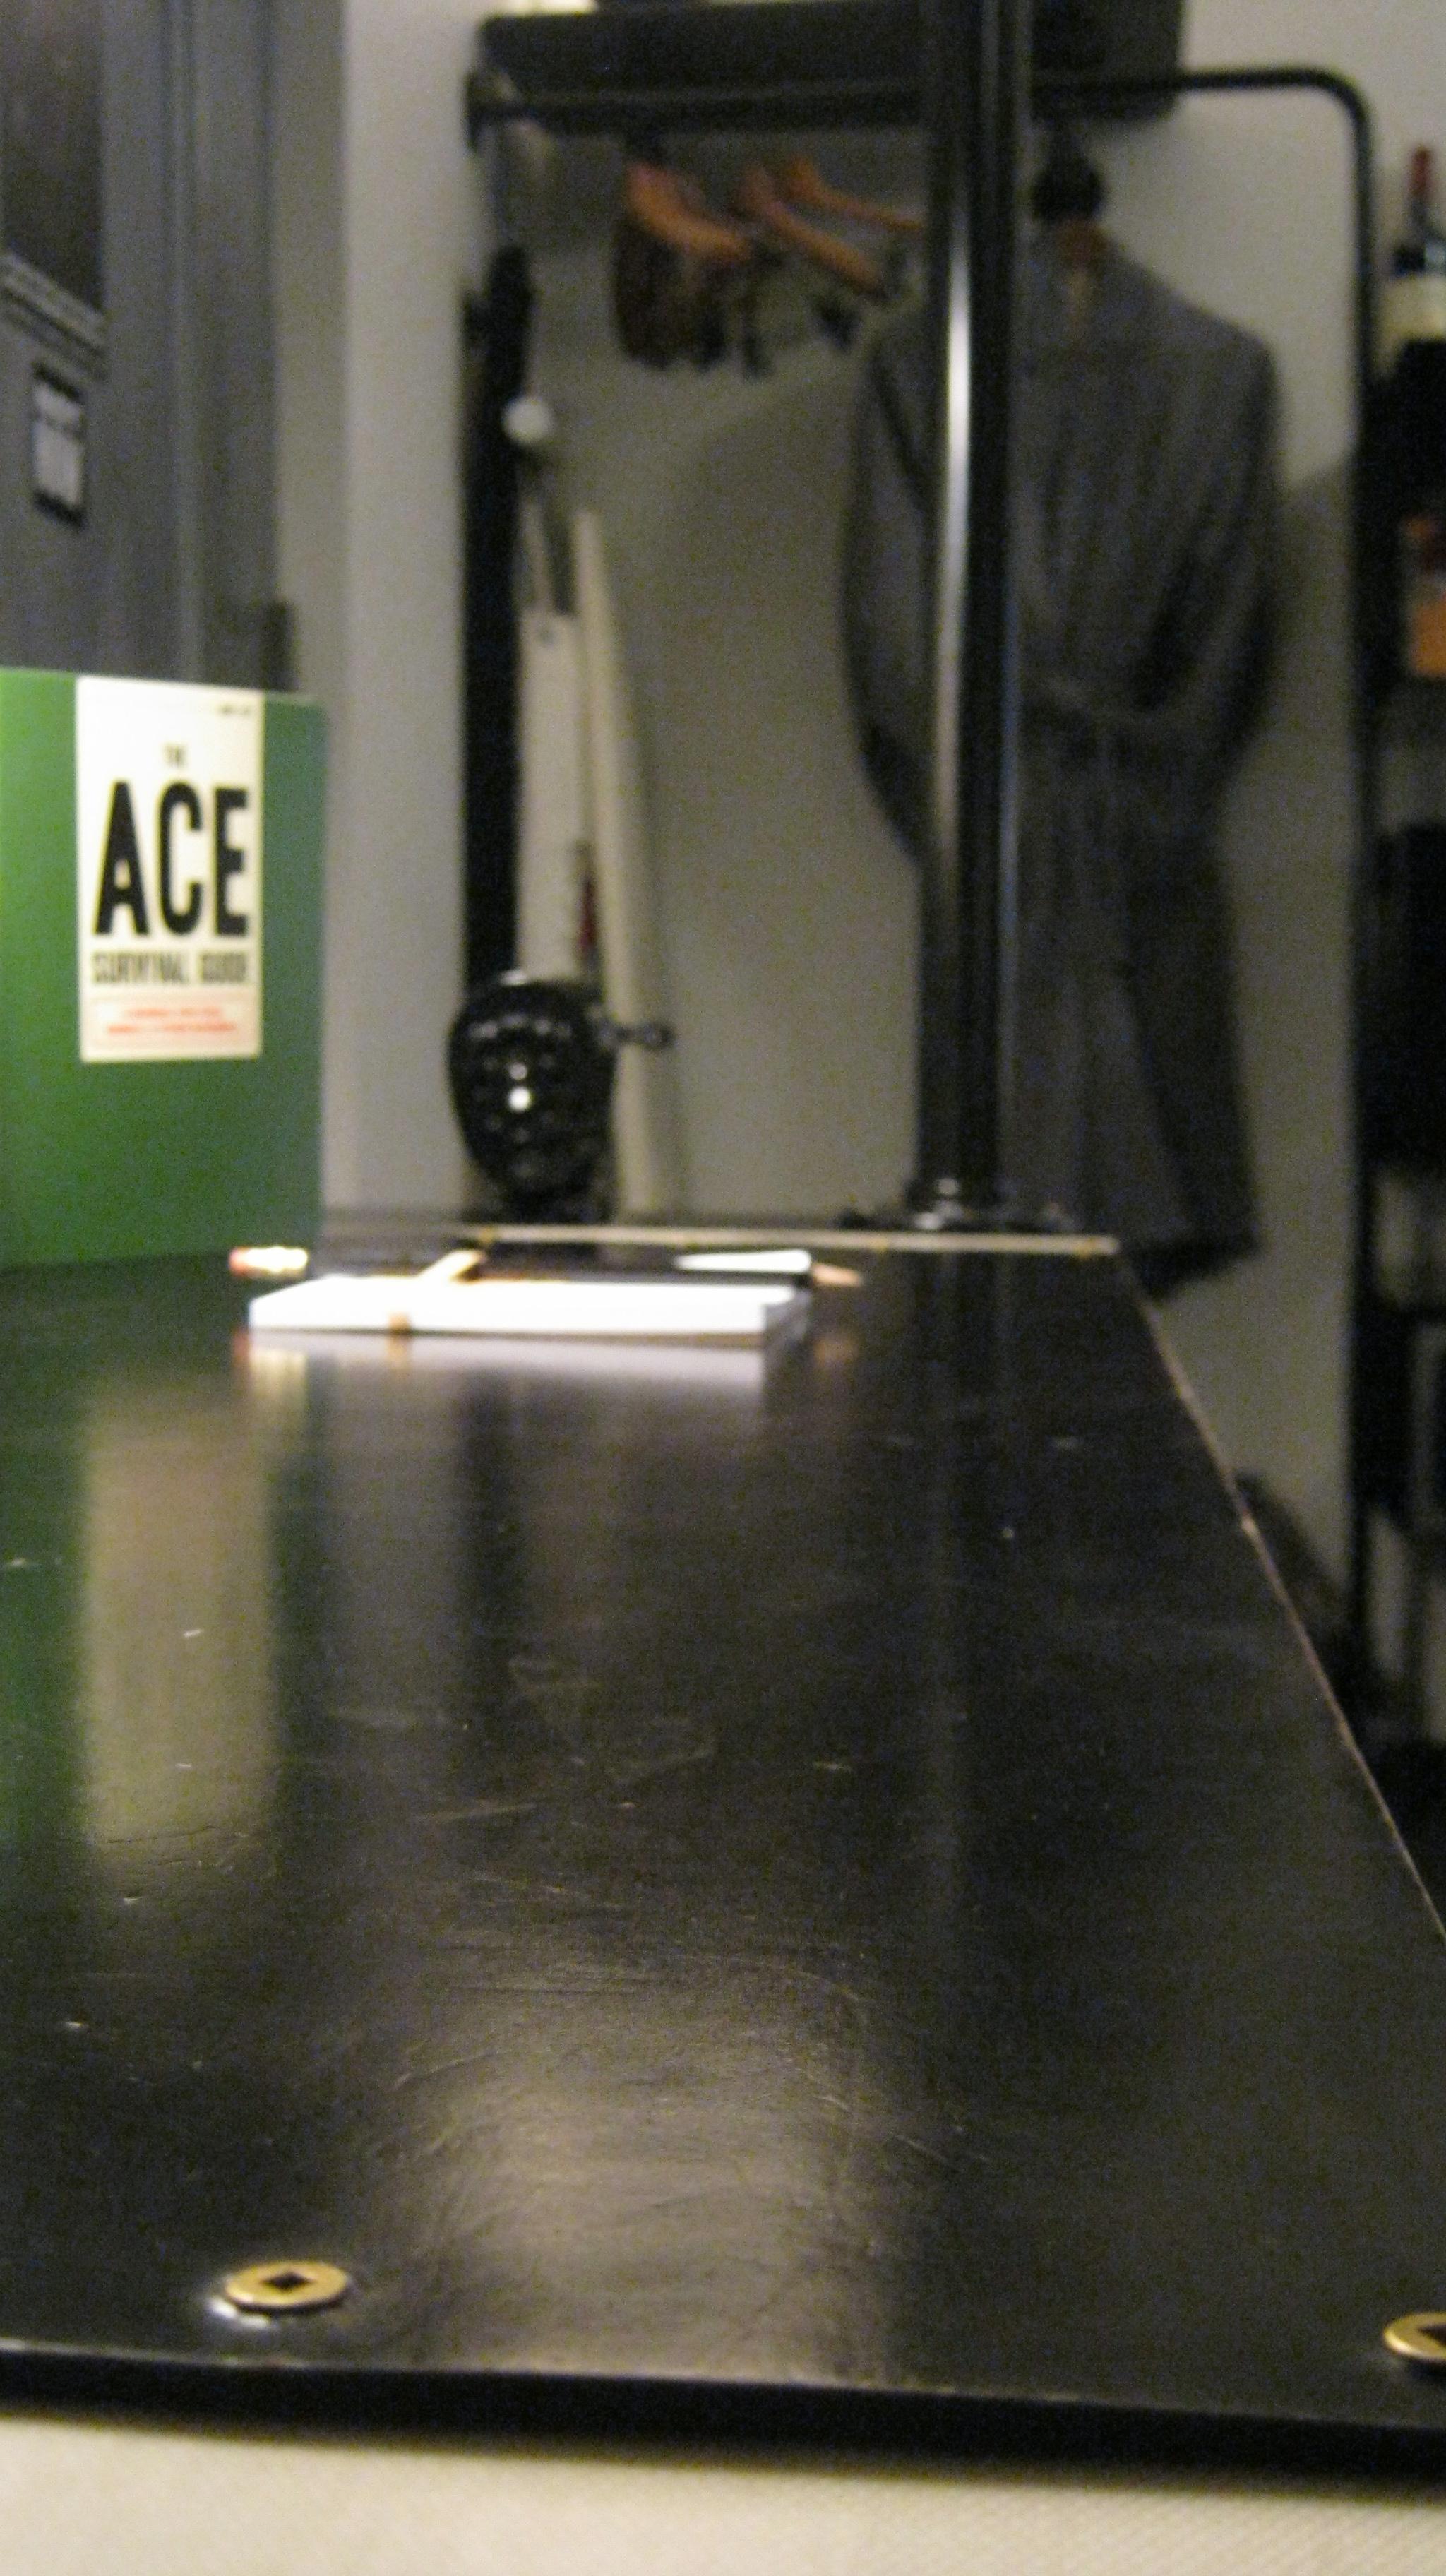 Hotel Ace - NYC - Custom Distressed Leather - EcoDomo.JPG